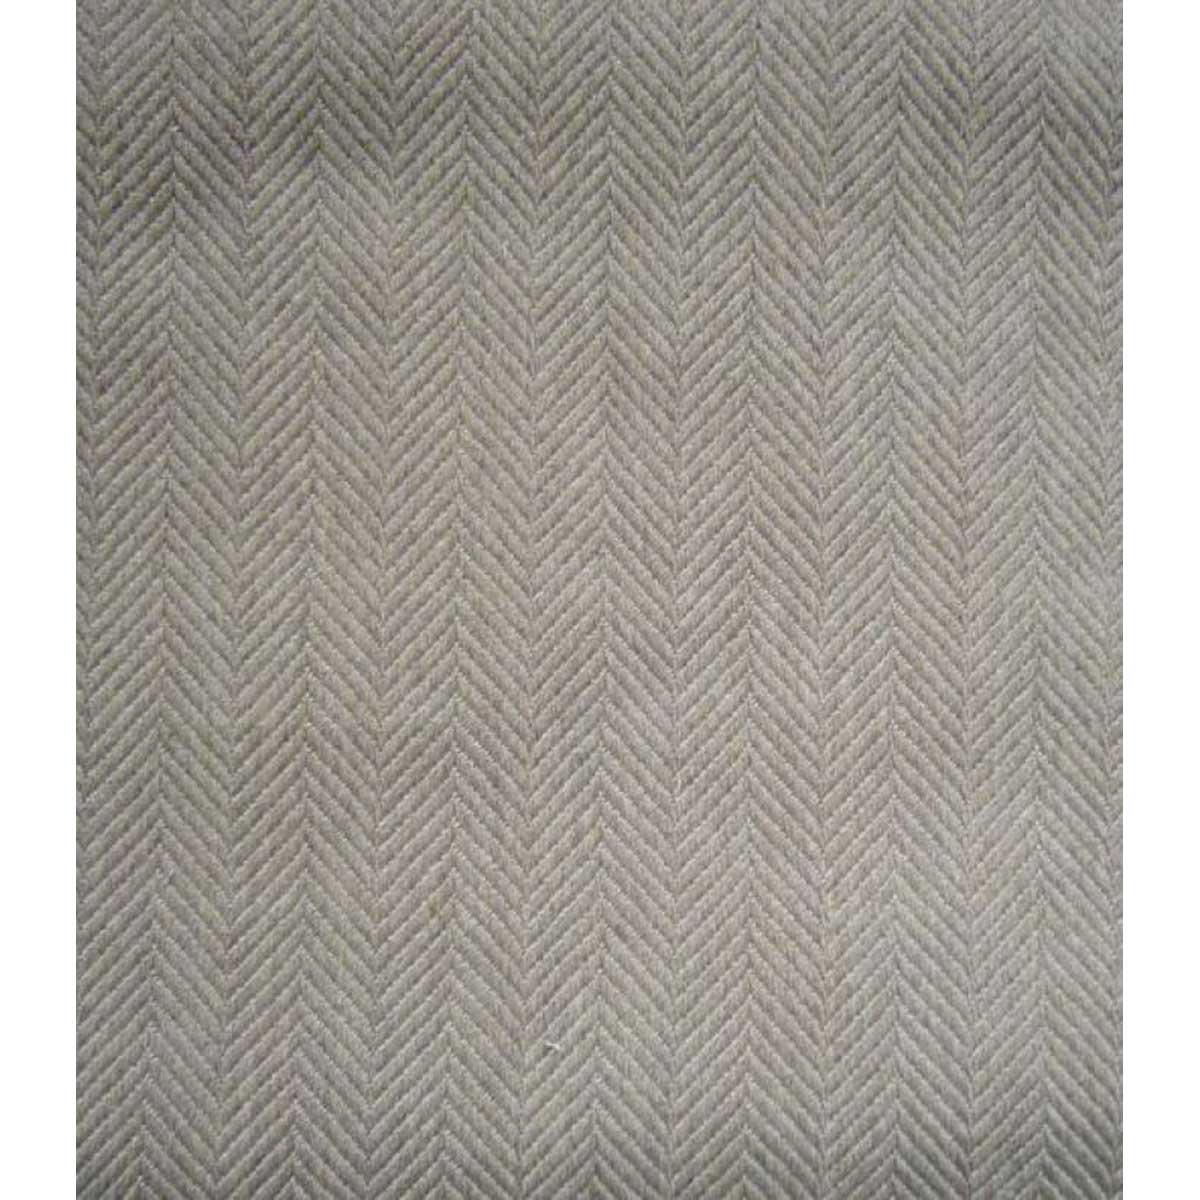 Tissu à tissage chevrons - Ficelle - 2.8 m